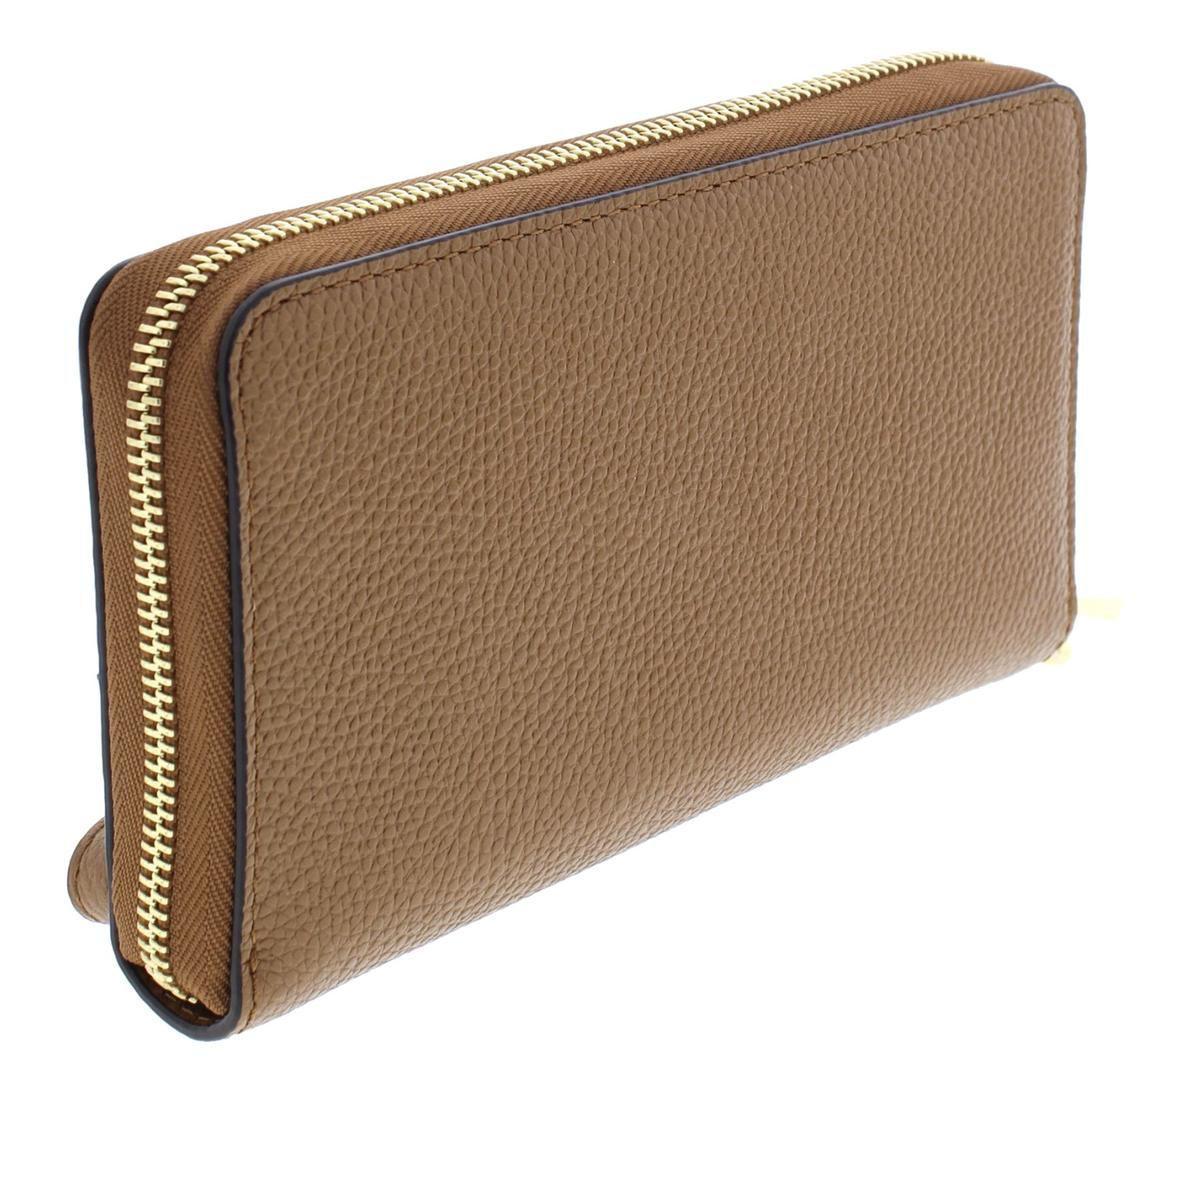 c6e064ab8051 MICHAEL Michael Kors - Brown Womens Mercer Leather Multi Function Wristlet  Wallet - Lyst. View fullscreen